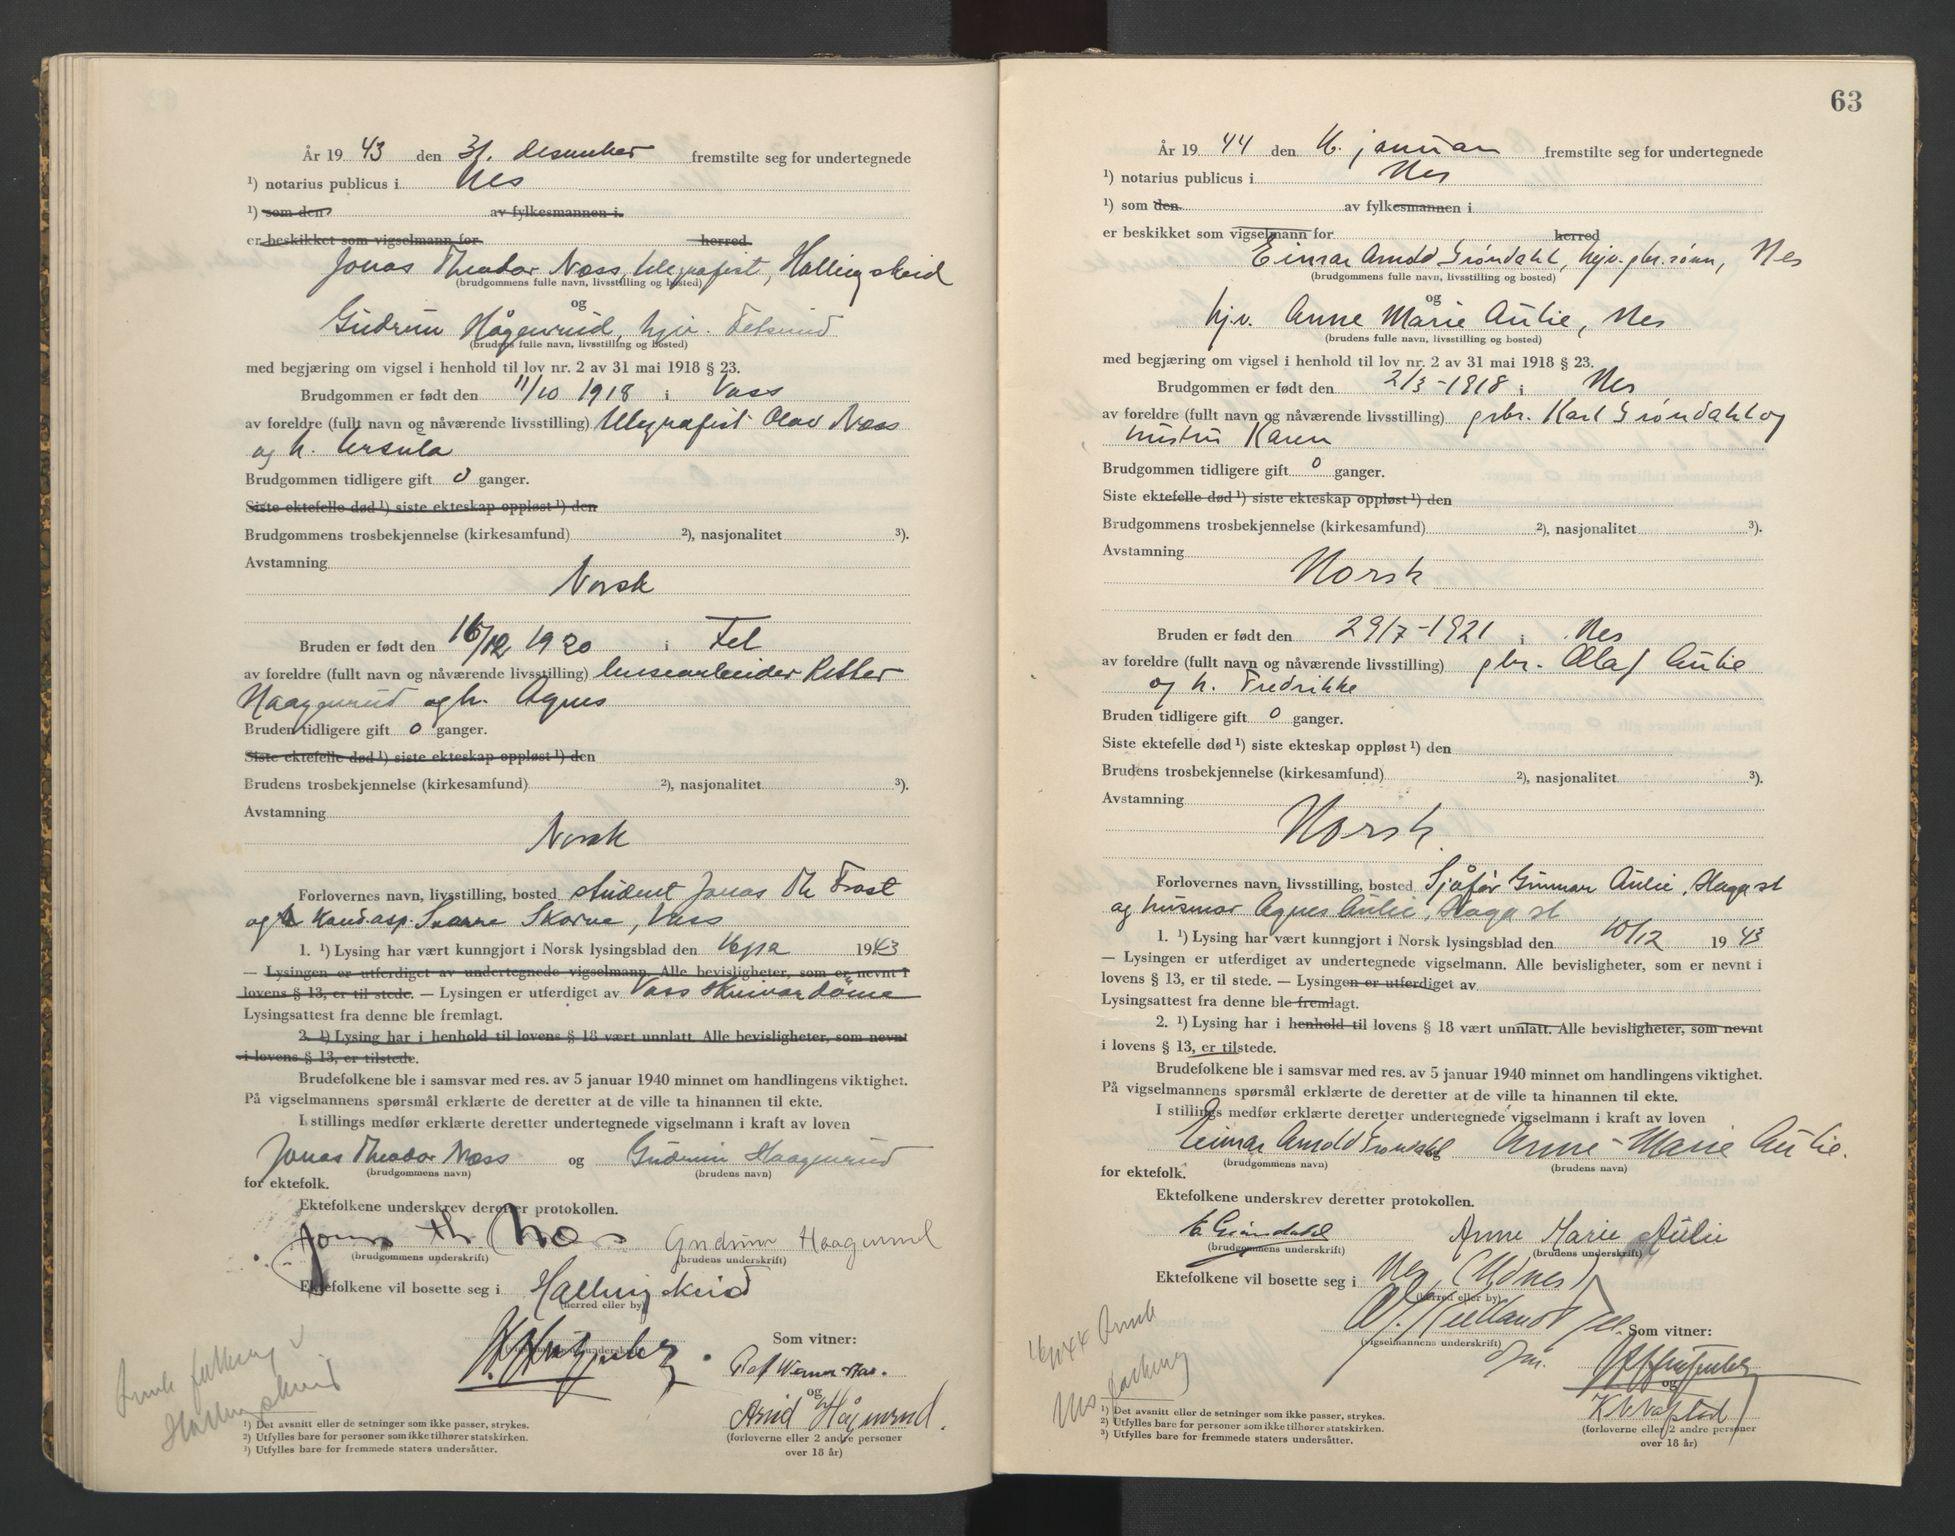 SAO, Nes tingrett, L/Lc/Lca/L0002: Vigselbok, 1943-1944, s. 63